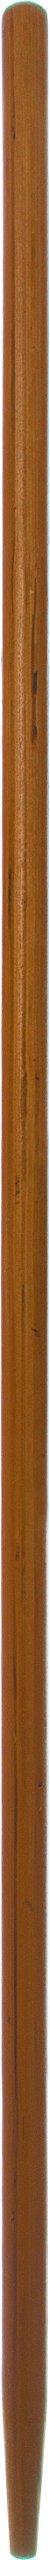 Carlisle 4026200 Flo-Pac Hardwood Tapered Handle, 1-1/8'' Dia. x 60'' L (Case of 12) by Carlisle (Image #3)